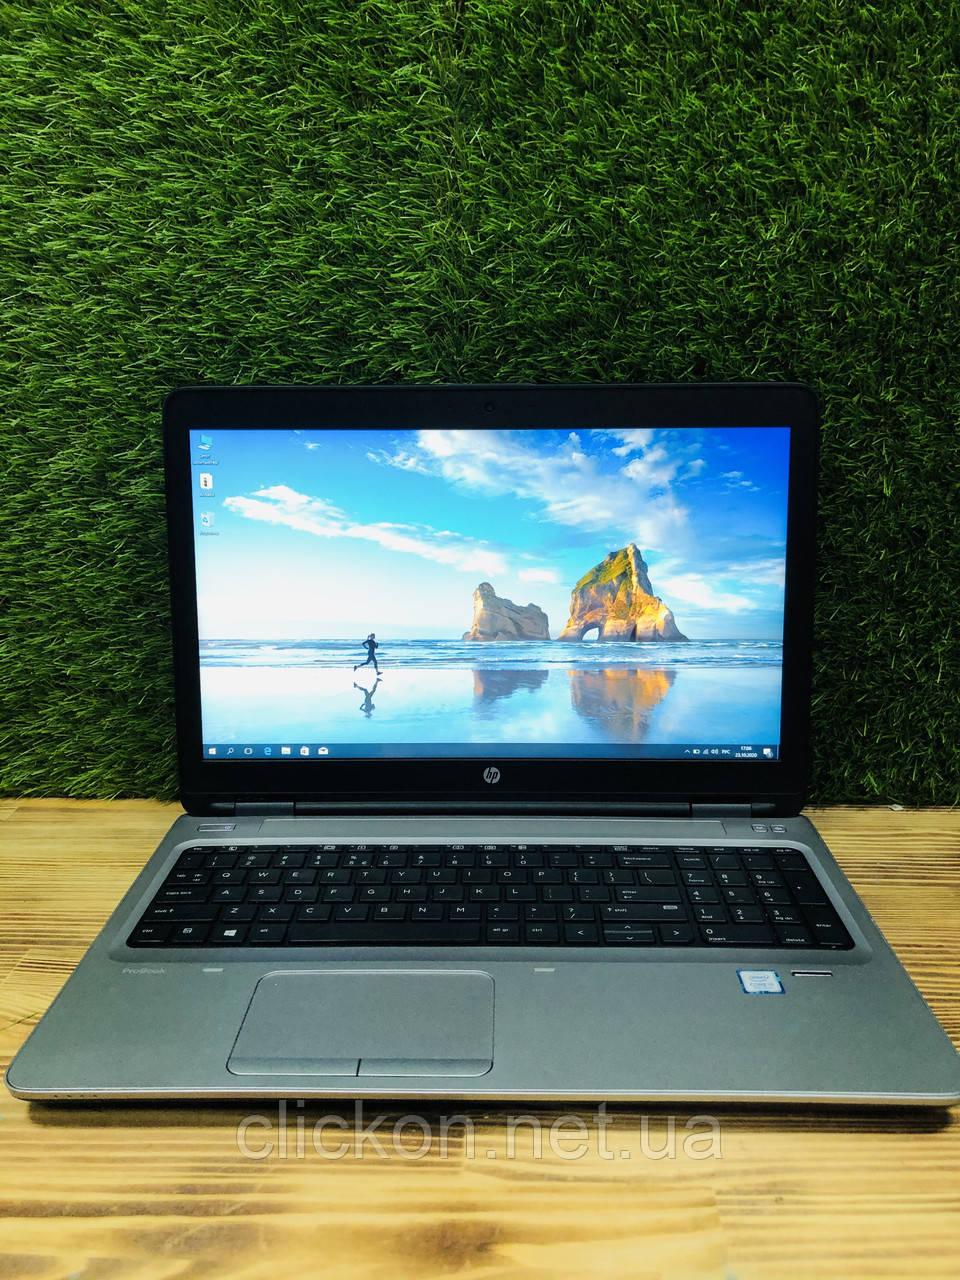 Ноутбук HP Probook 650 g3 i5-7200u /8GB / SSD 256 gb Б.у